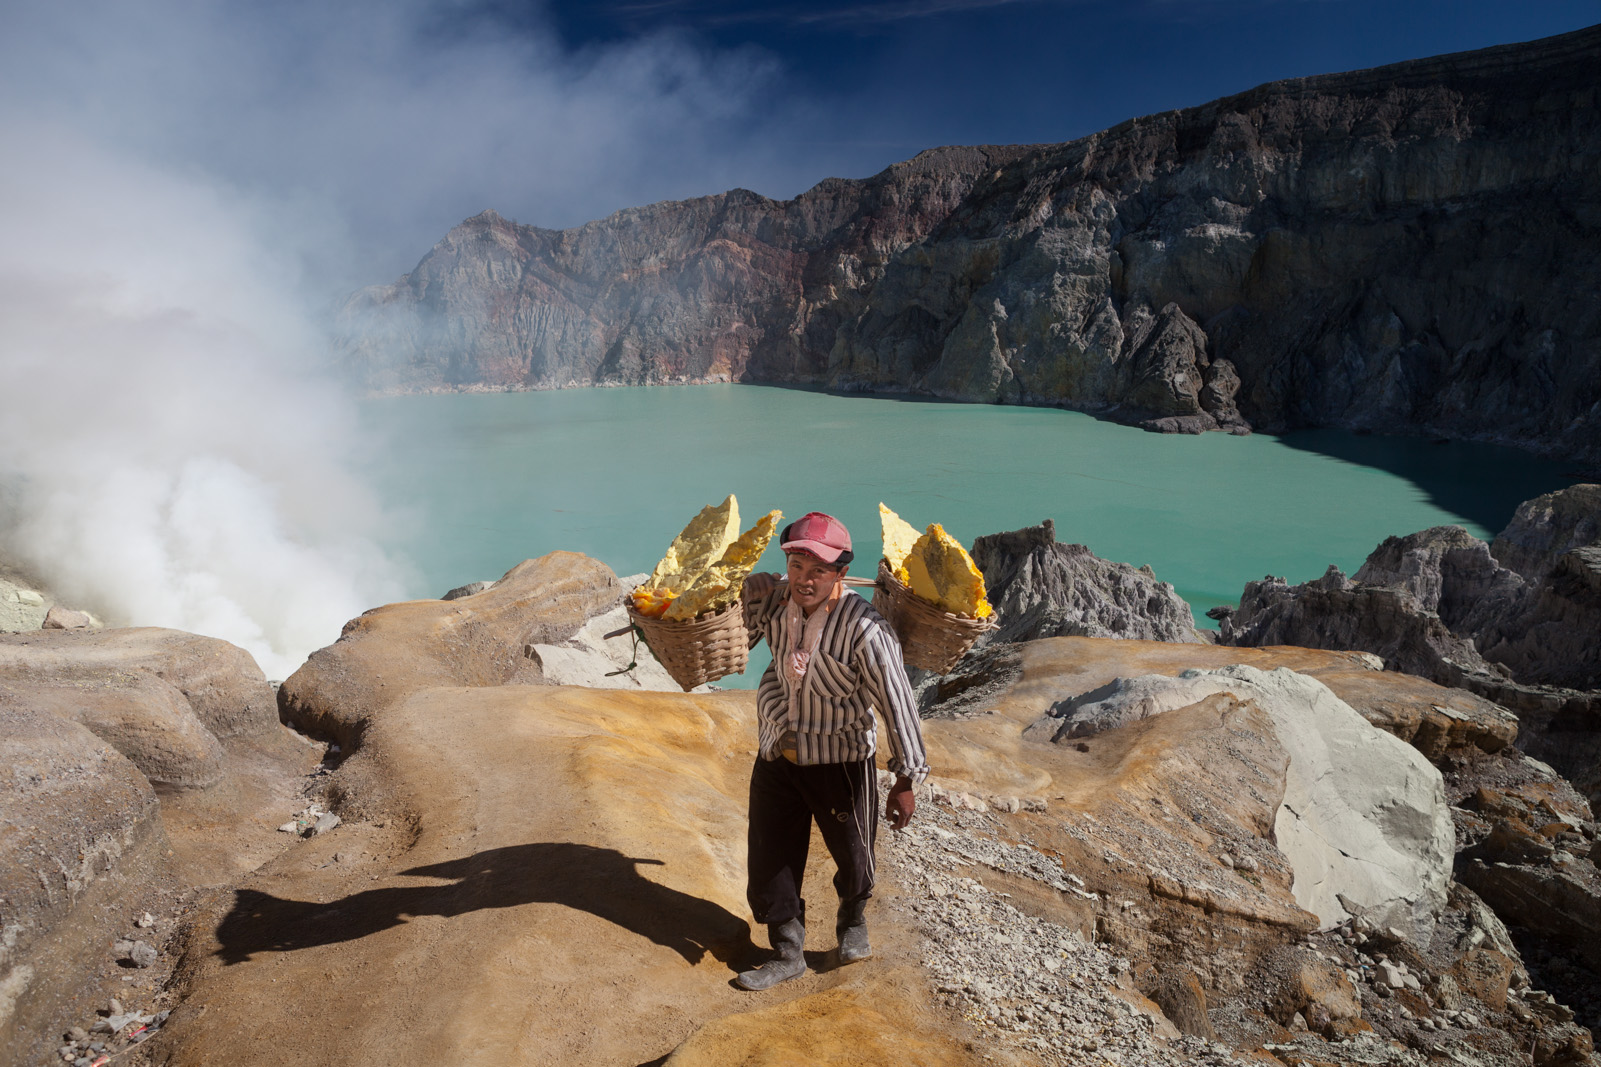 Sulfur worker, Ijen Crater, Banyuwangi, East Java